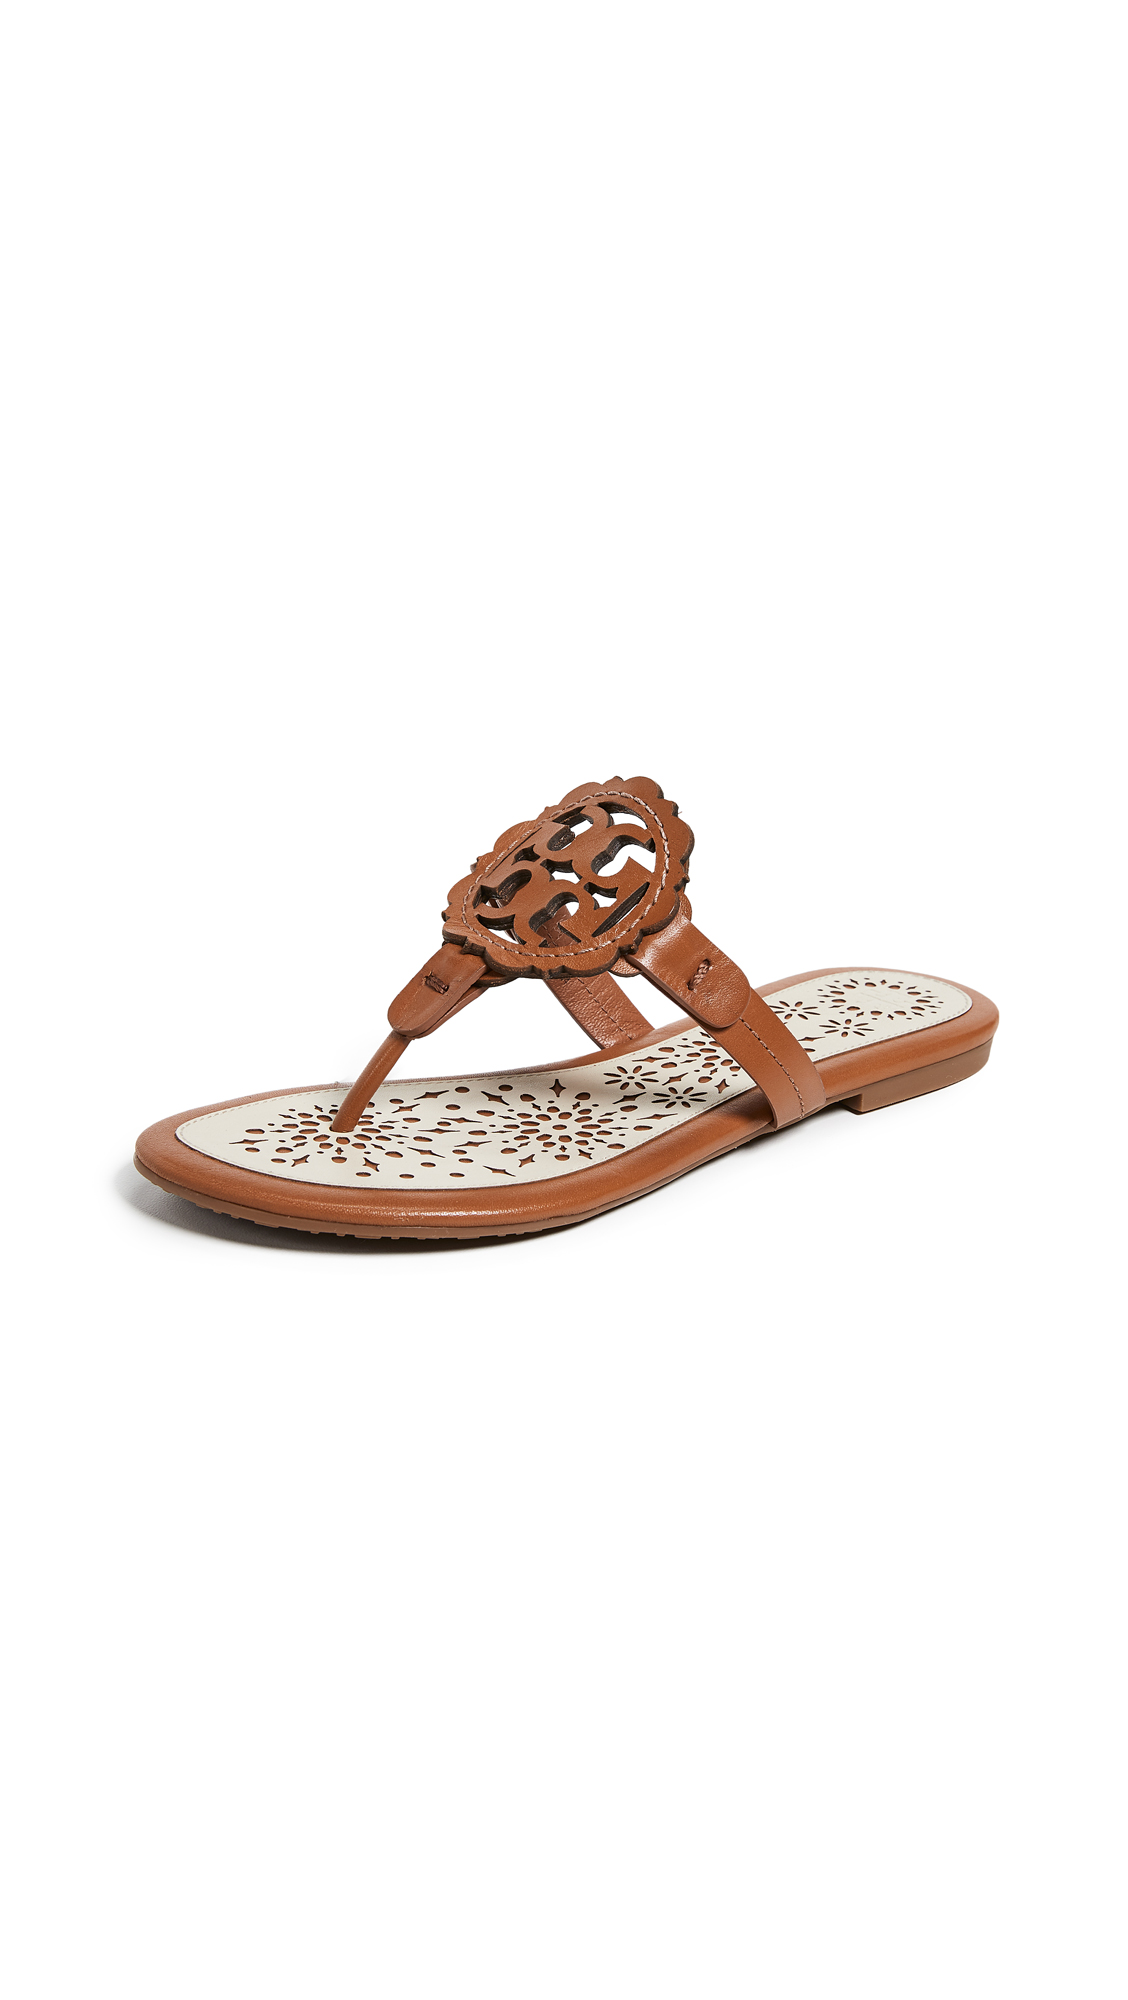 Tory Burch Miller Scallop Sandals - Tan/New Cream